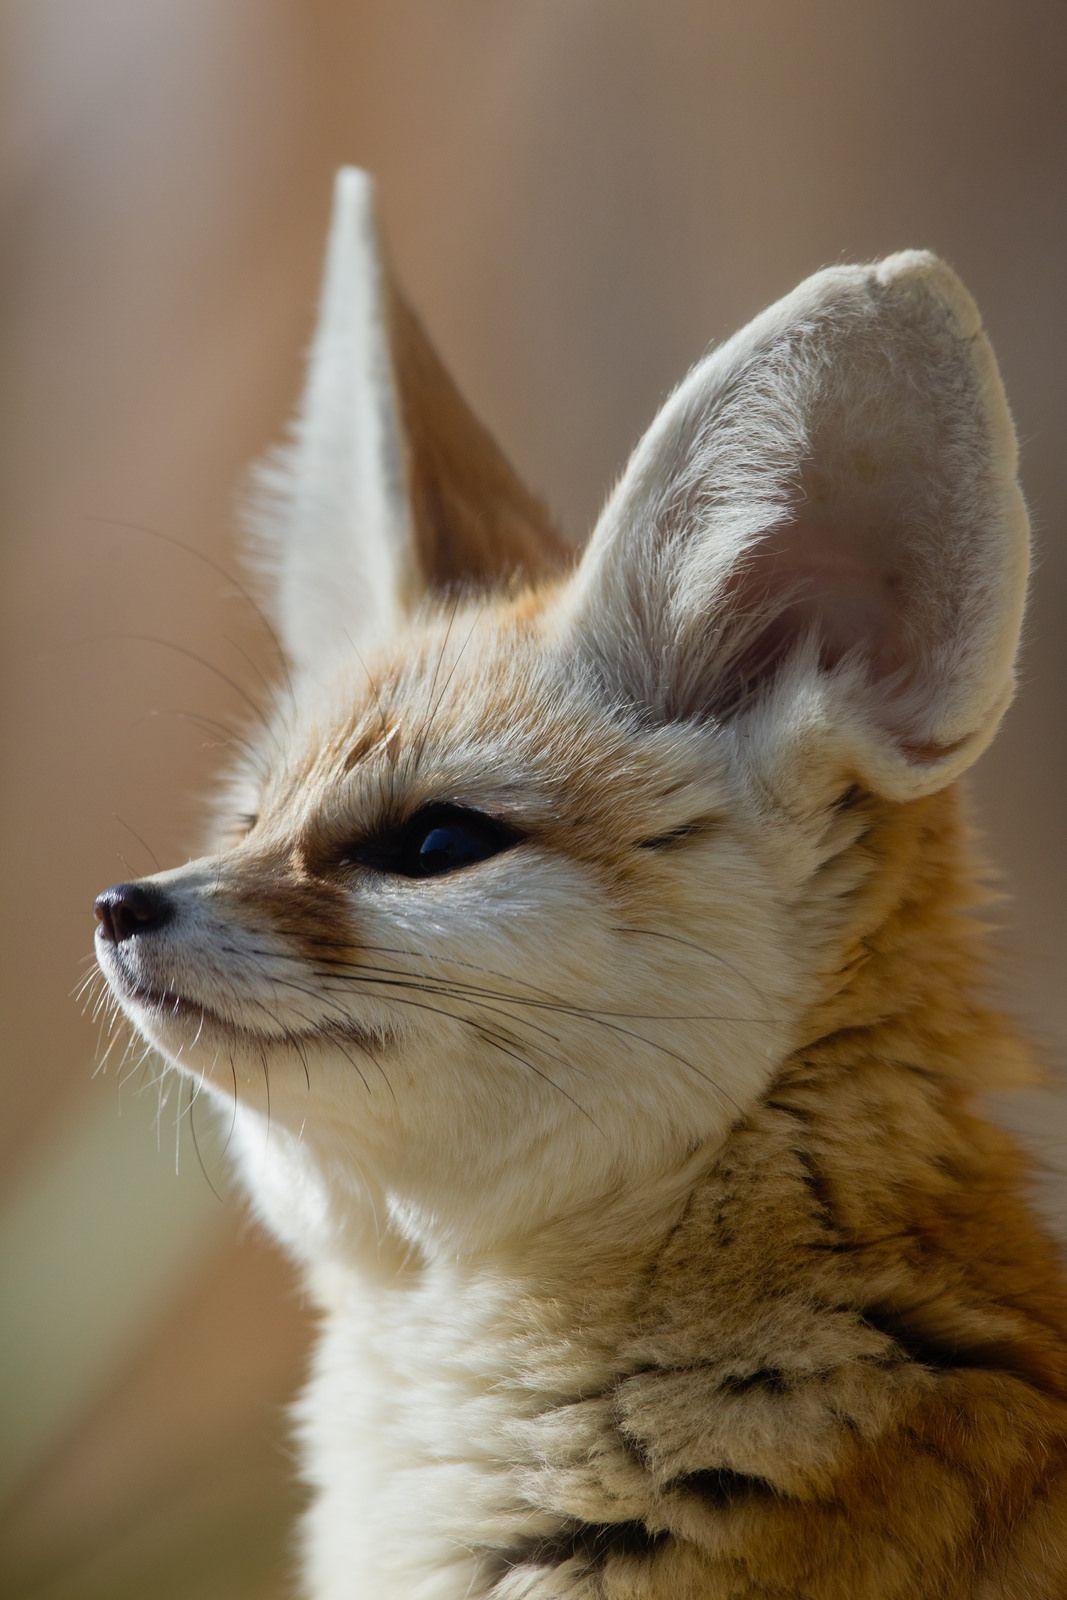 Fennec Fox Portrait Vulpes Zerda Extractum Belladonnae